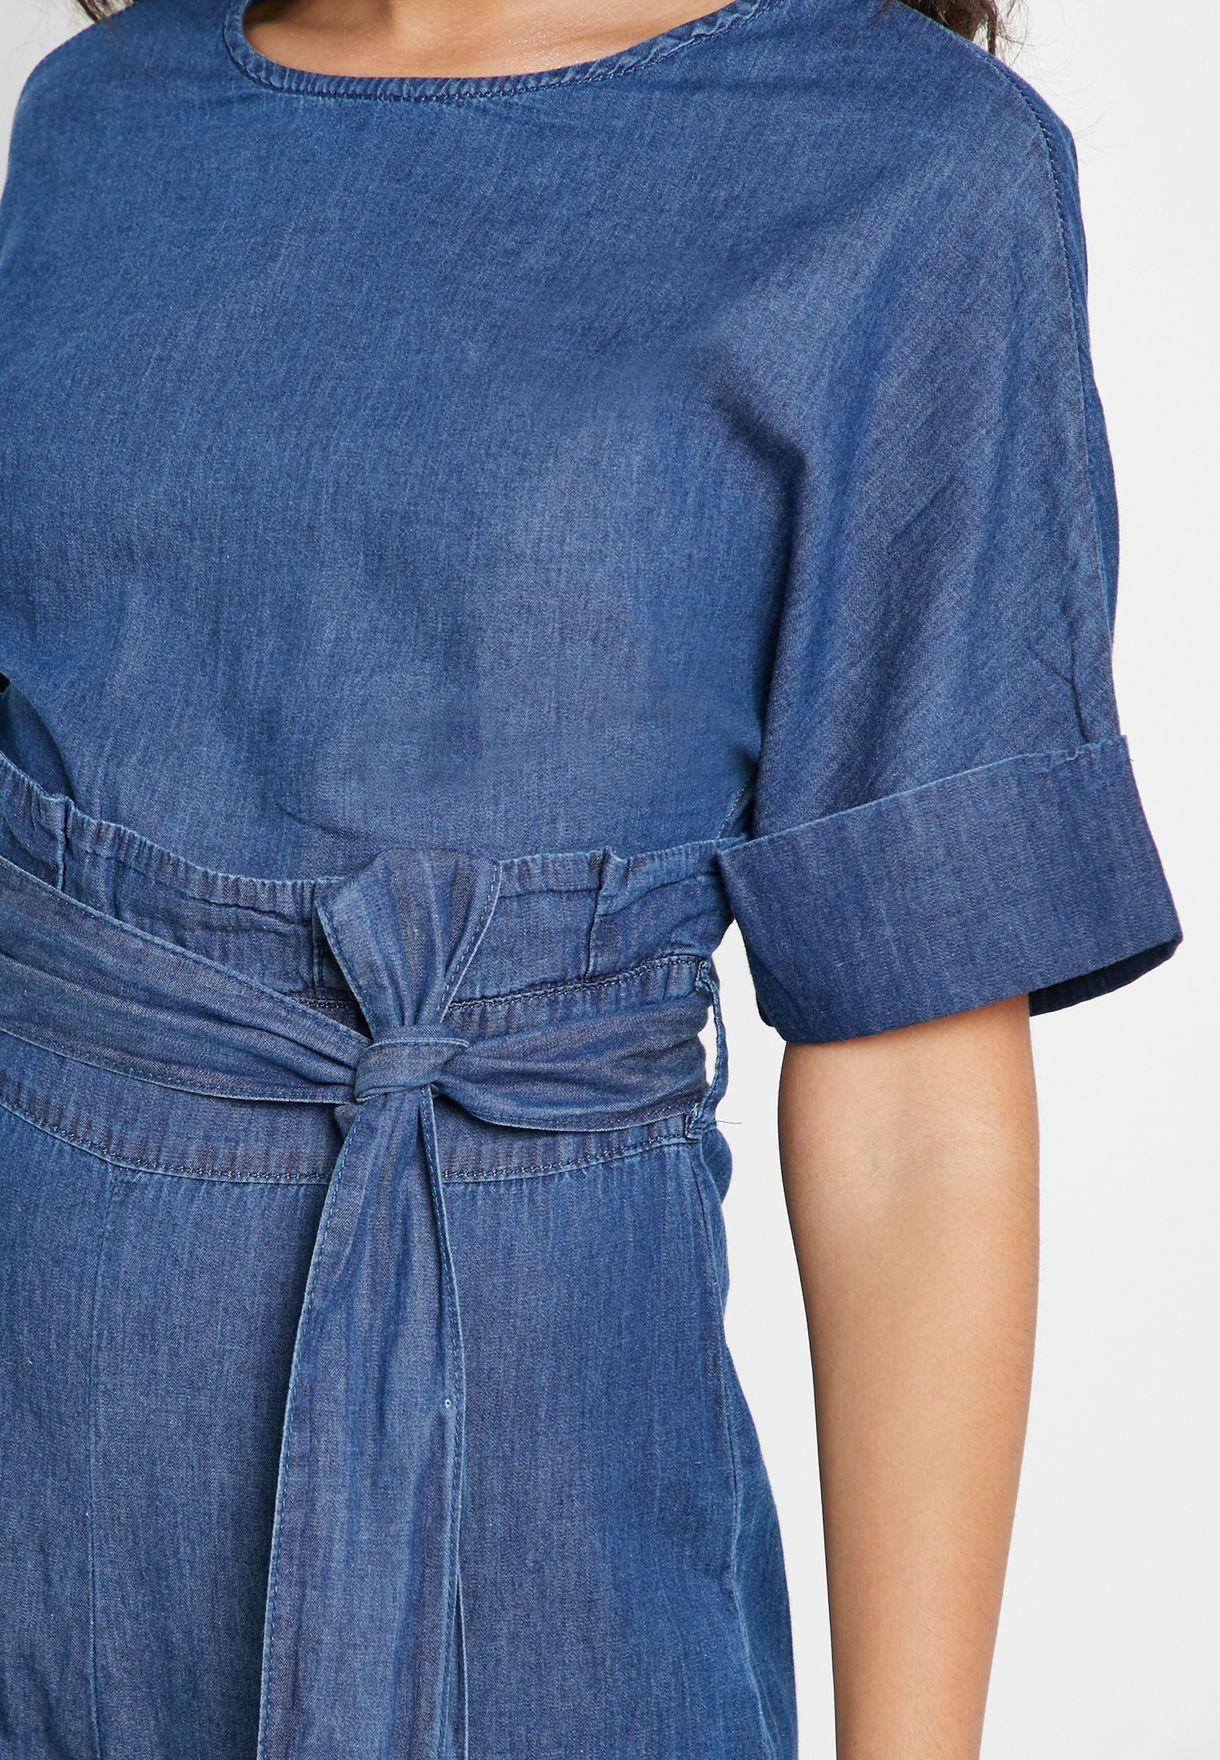 افرول طويل (جمبسوت) جينز